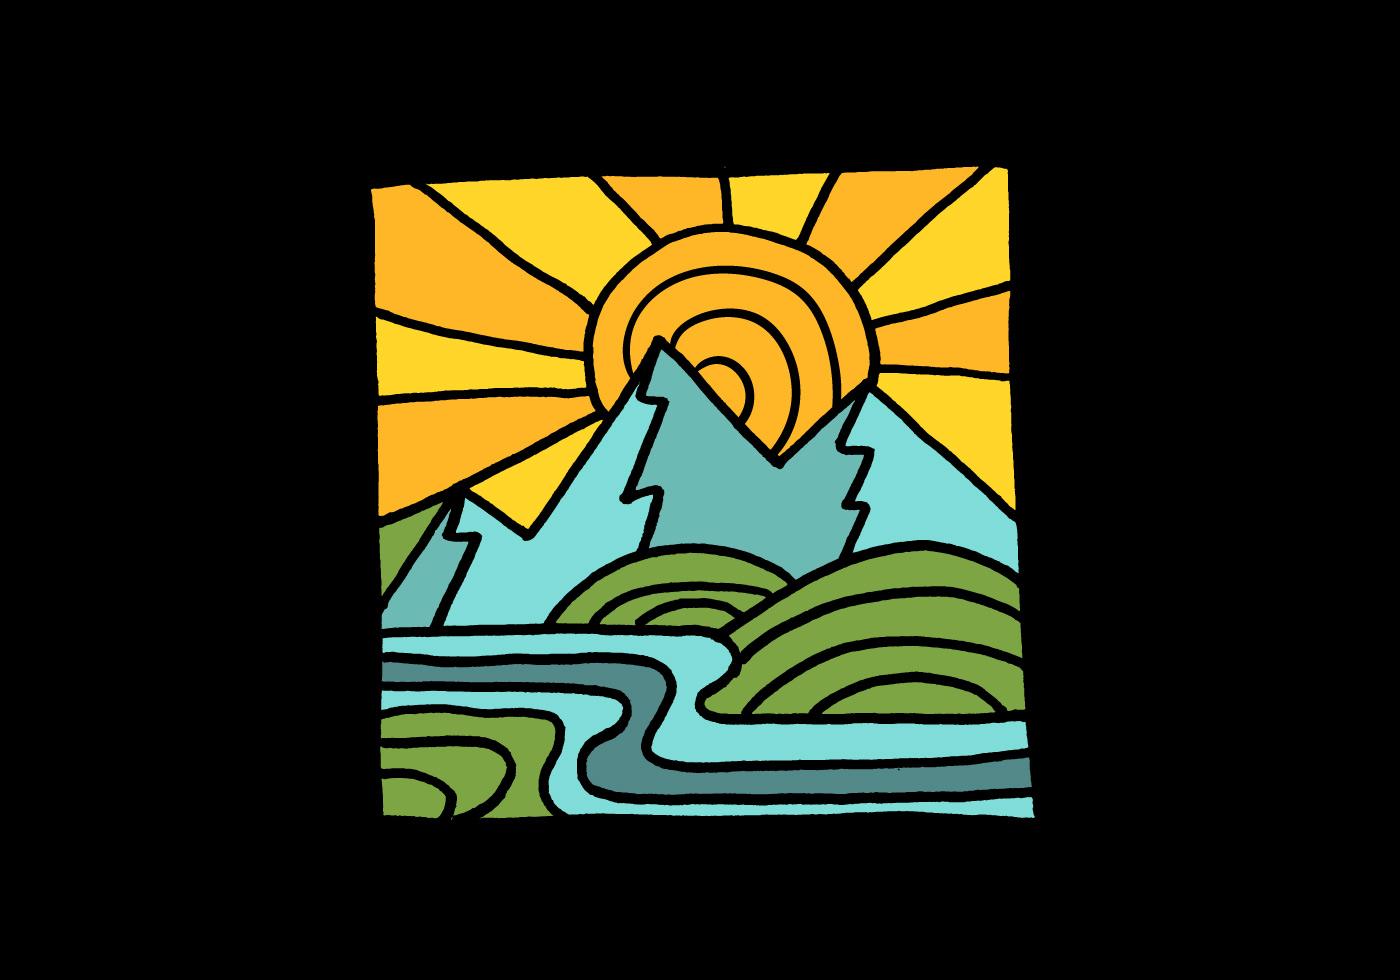 Minimal landscape badge download free vector art stock for Minimal art vector